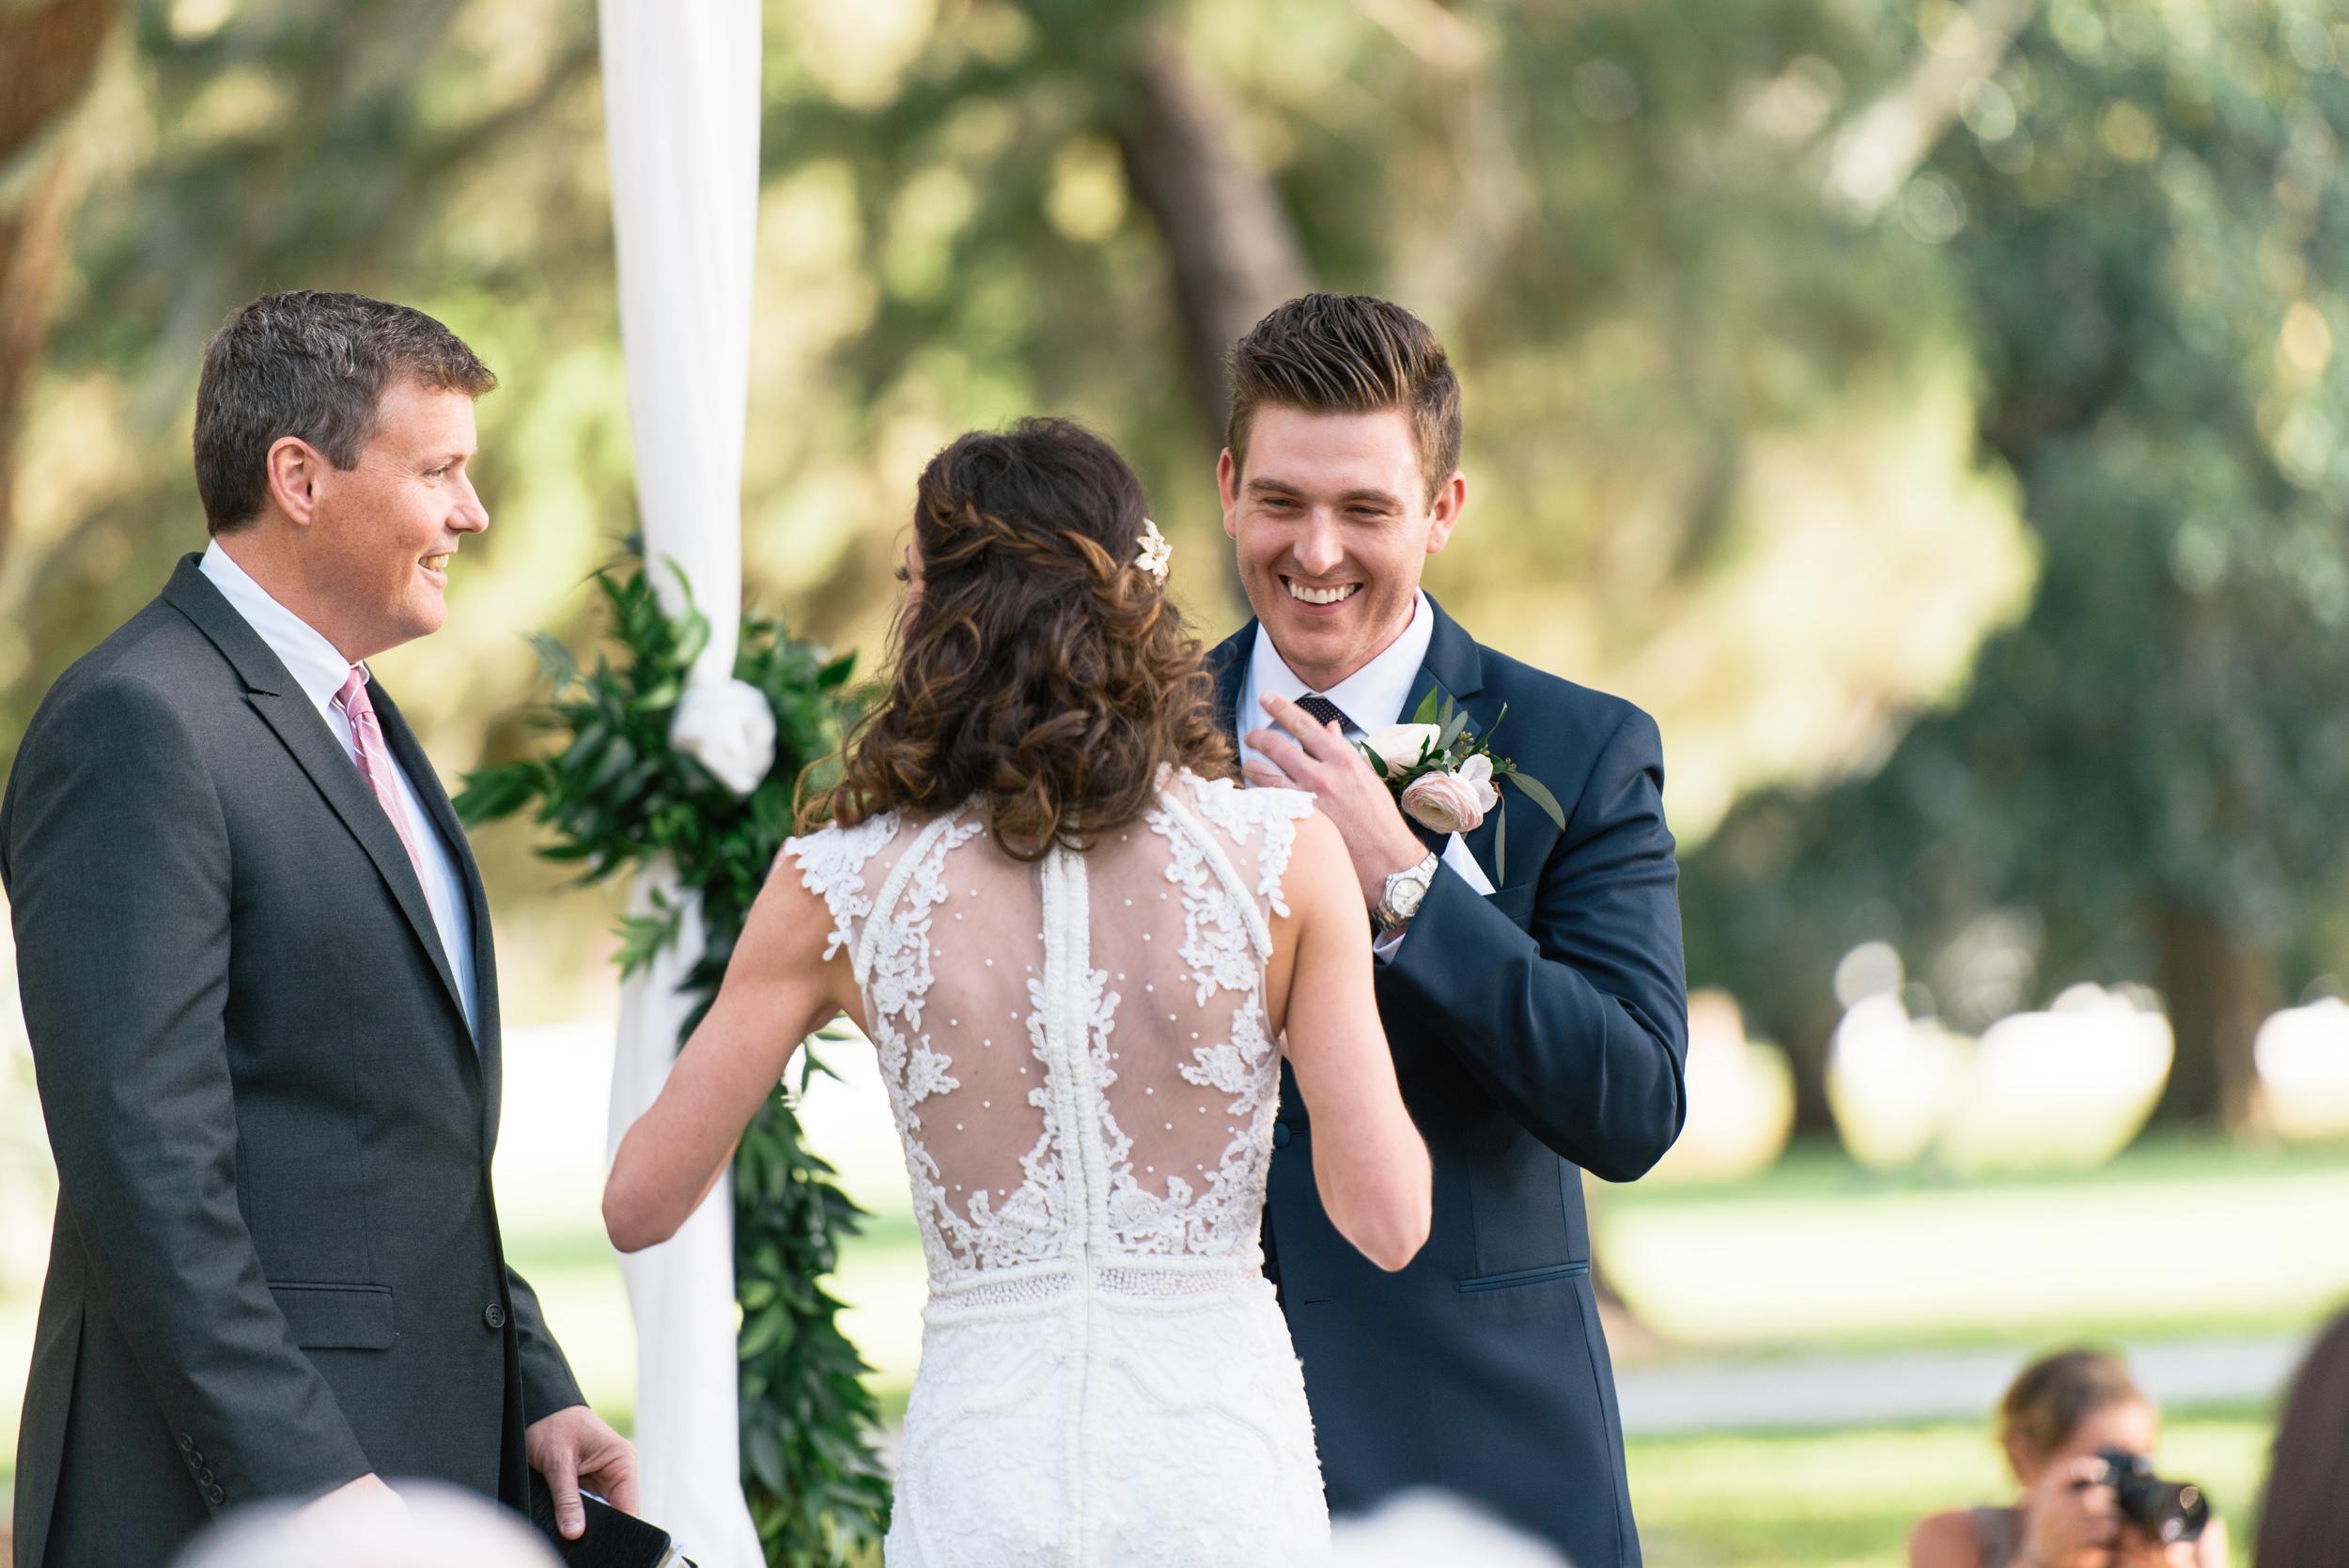 kadi-and-matt-carroll-april-9-2016-jekyl-island-wedding-m-newsom-photography- (233 of 484).jpg